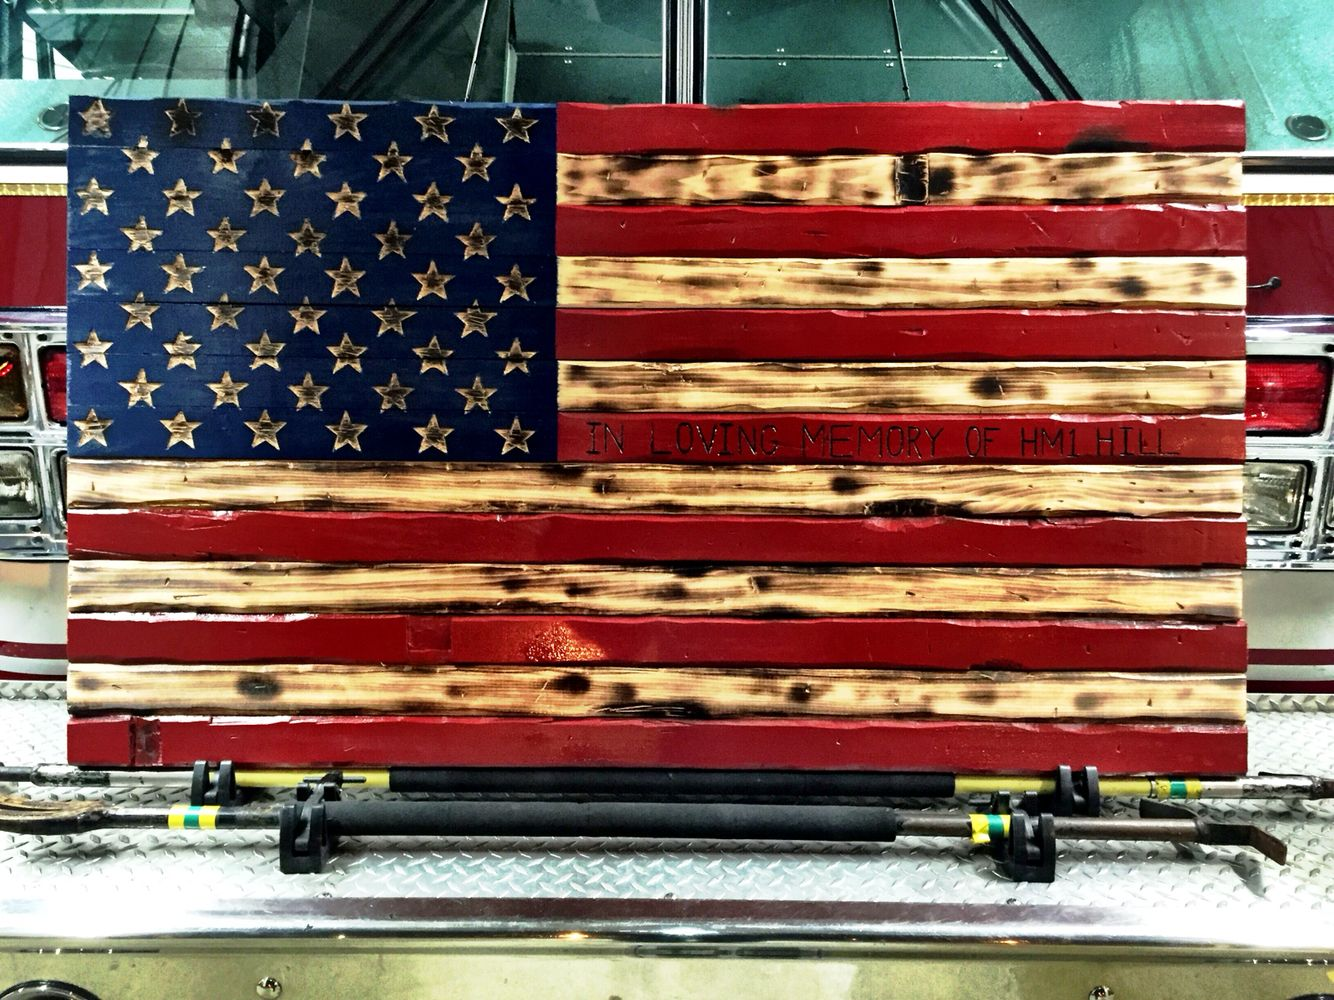 Hand Carved Rustic American Flag Burned Wood Art Https Www Etsy Com Shop Rusticamericandecor Wood Art Projects American Flag Pallet Rustic American Flag